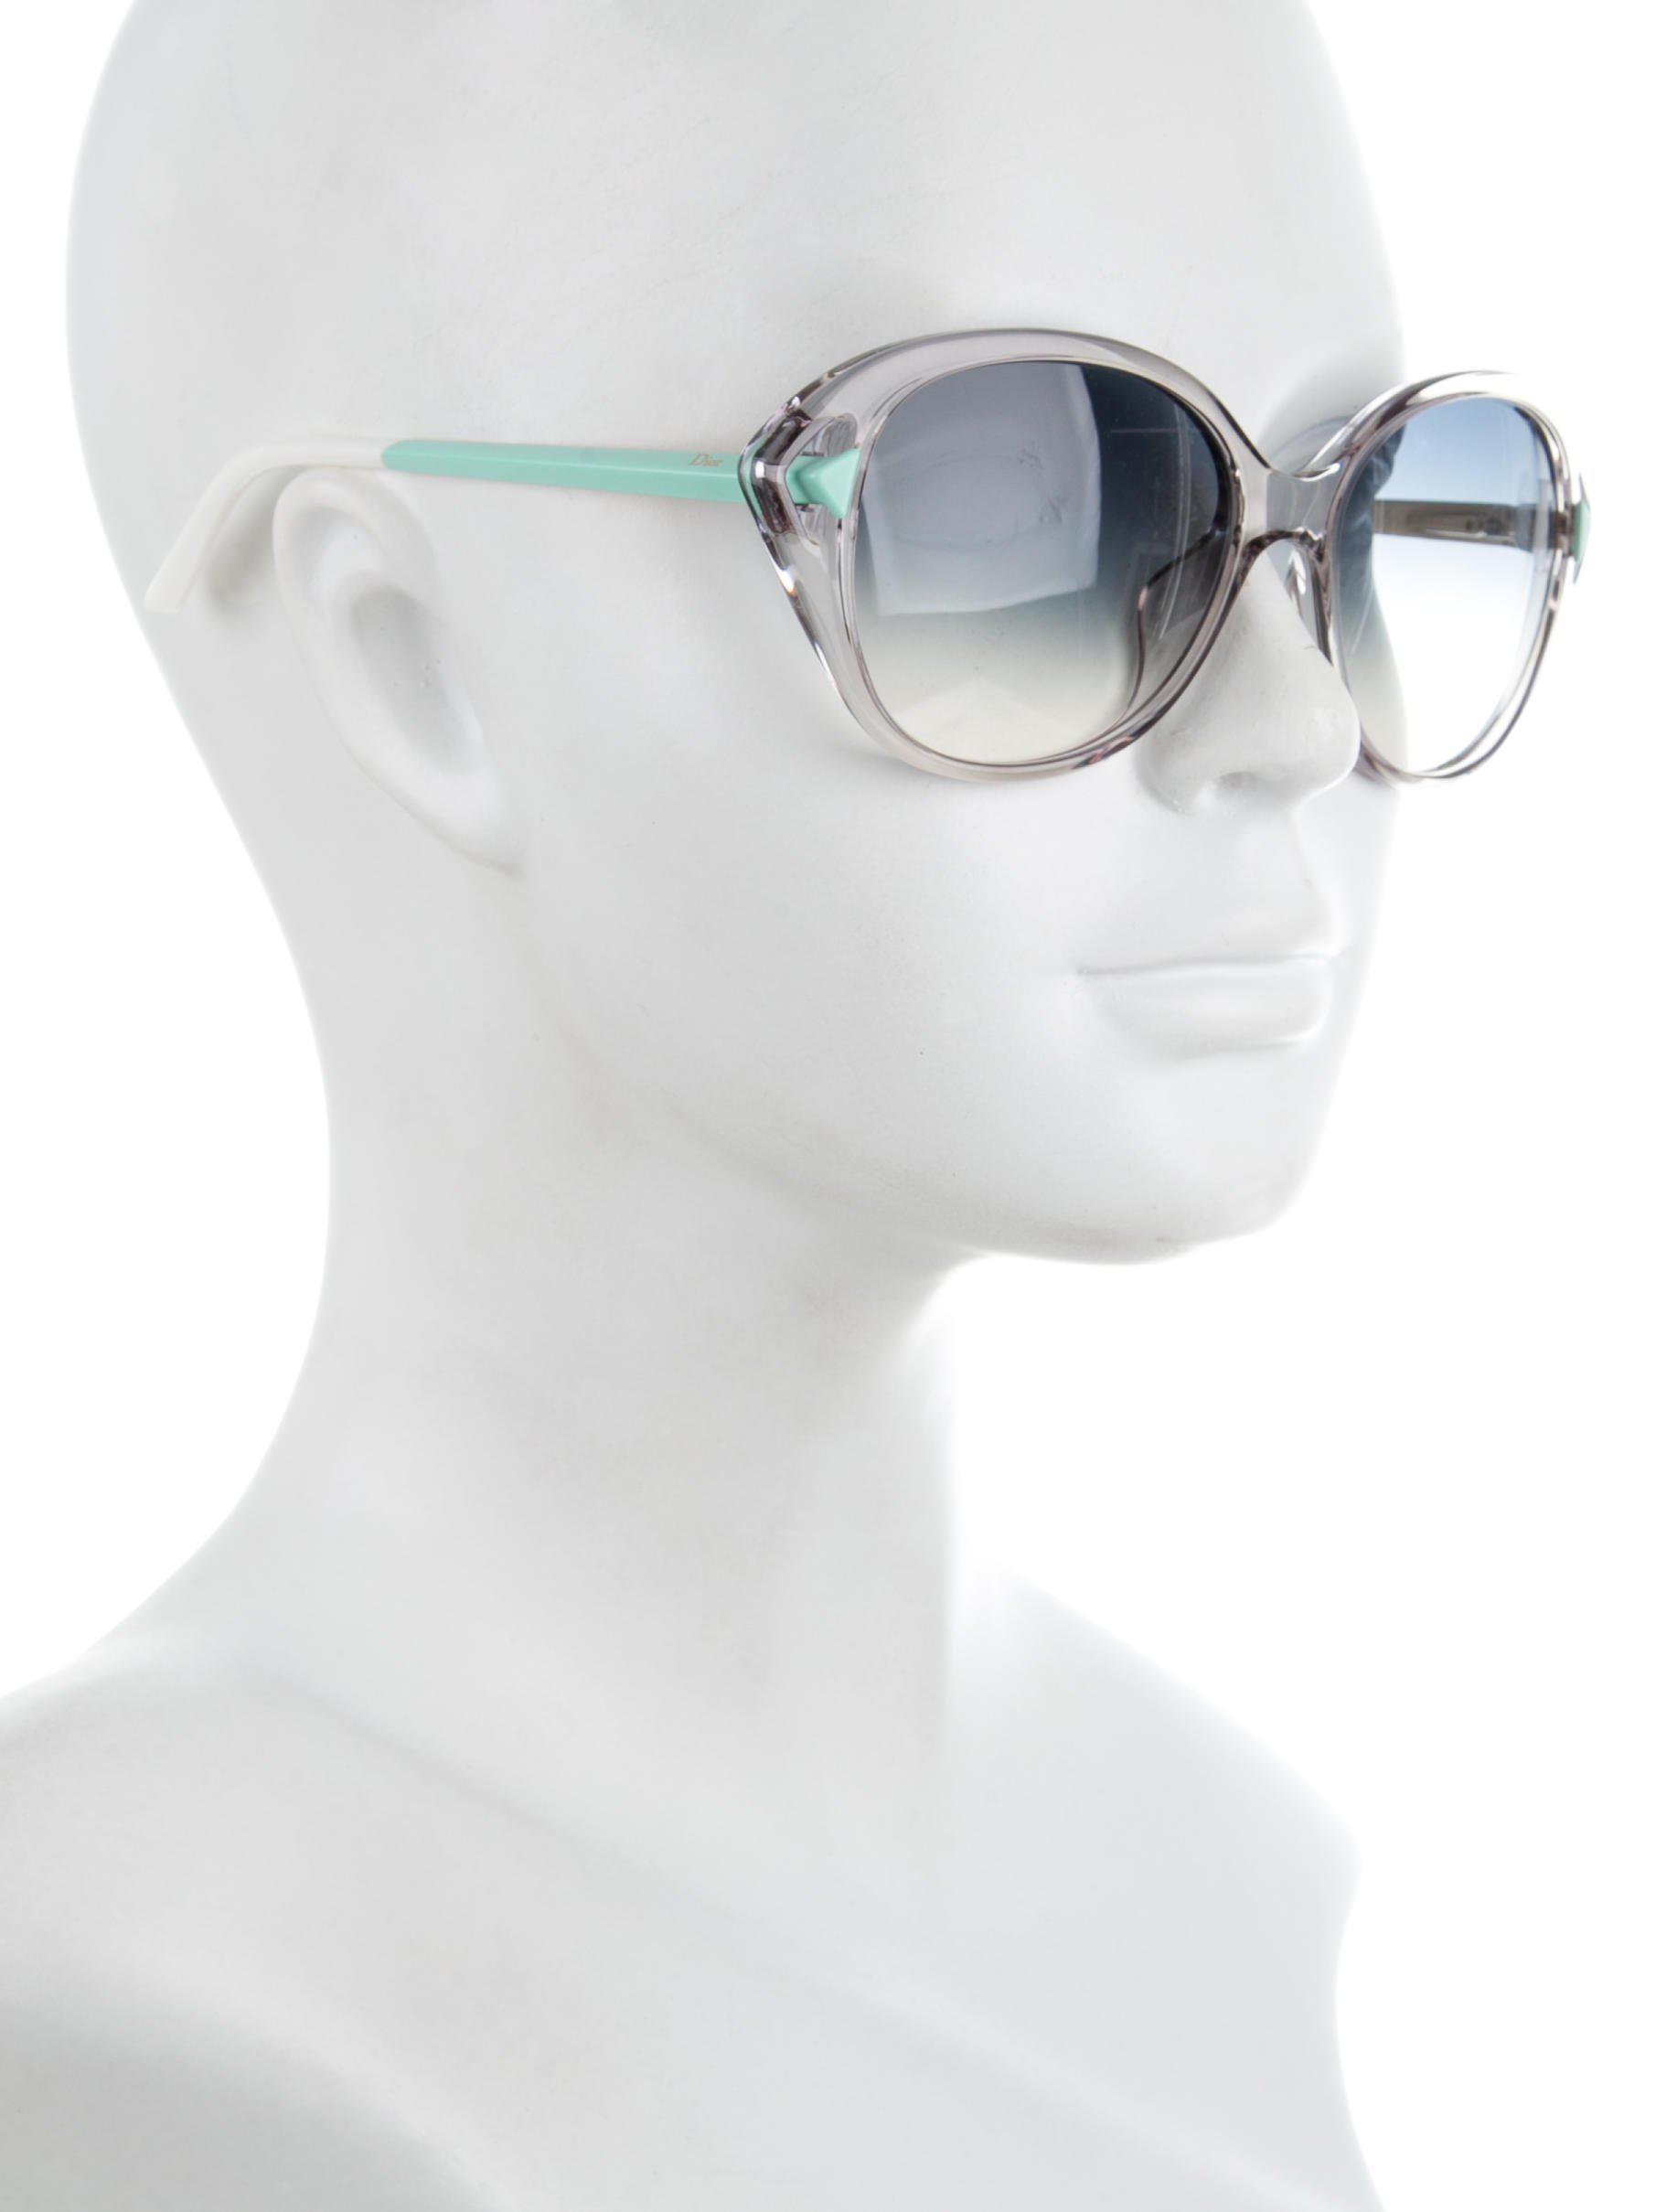 2e382bc13c62 Lyst - Dior Chromatic 2 Sunglasses Clear in Metallic